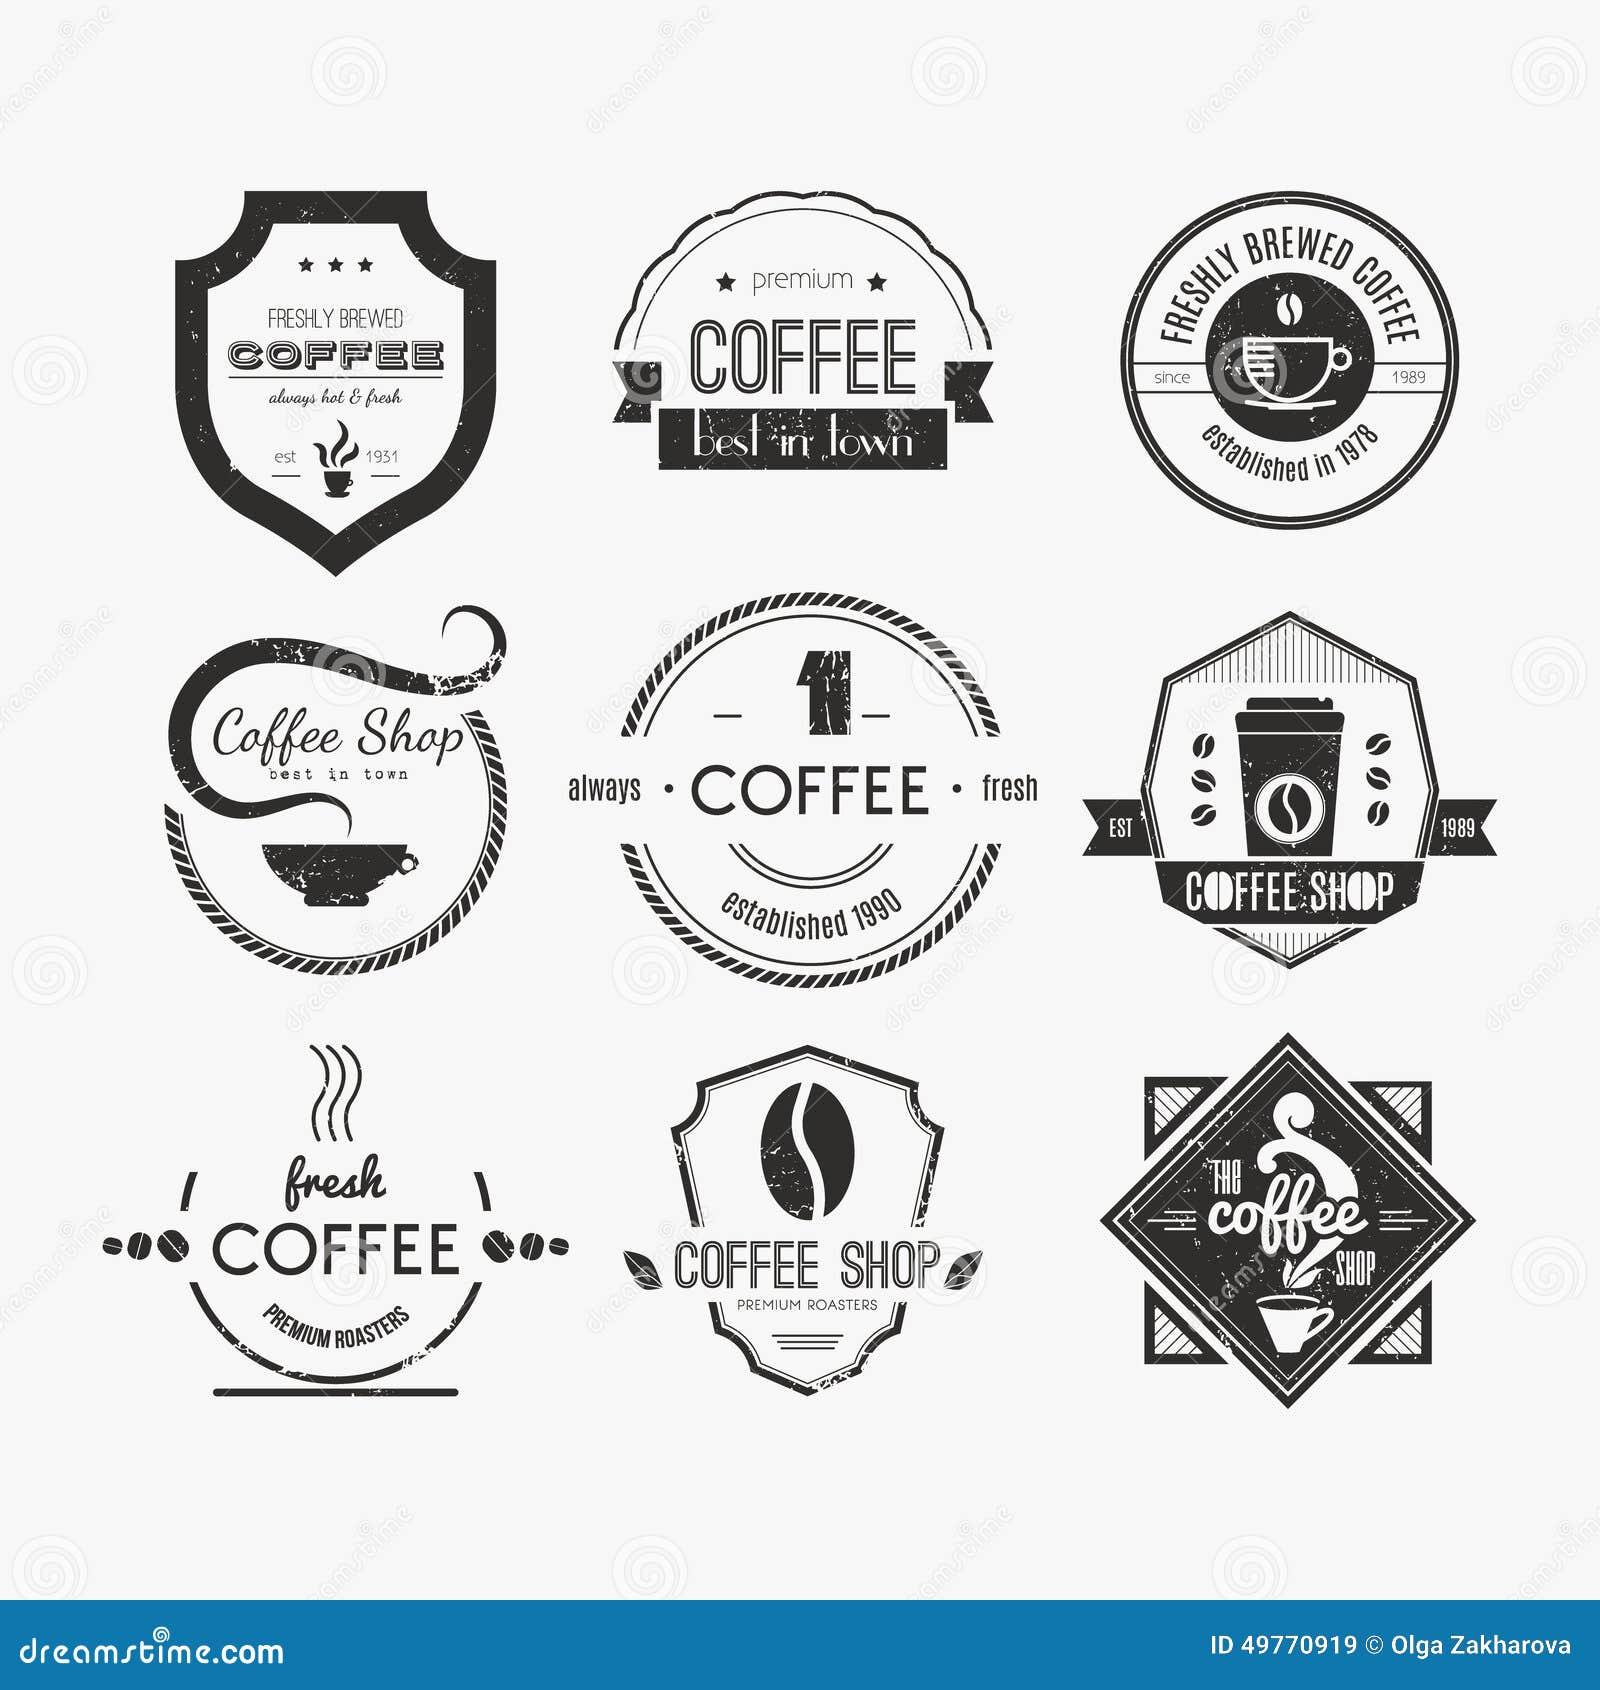 Art logo logo s coffee logo coffee shop coffee design shop logo coffee - Coffee Collection Design Logo Logotype Quality Restaurant Retro Set Shop Vintage Traditional Stamp Art